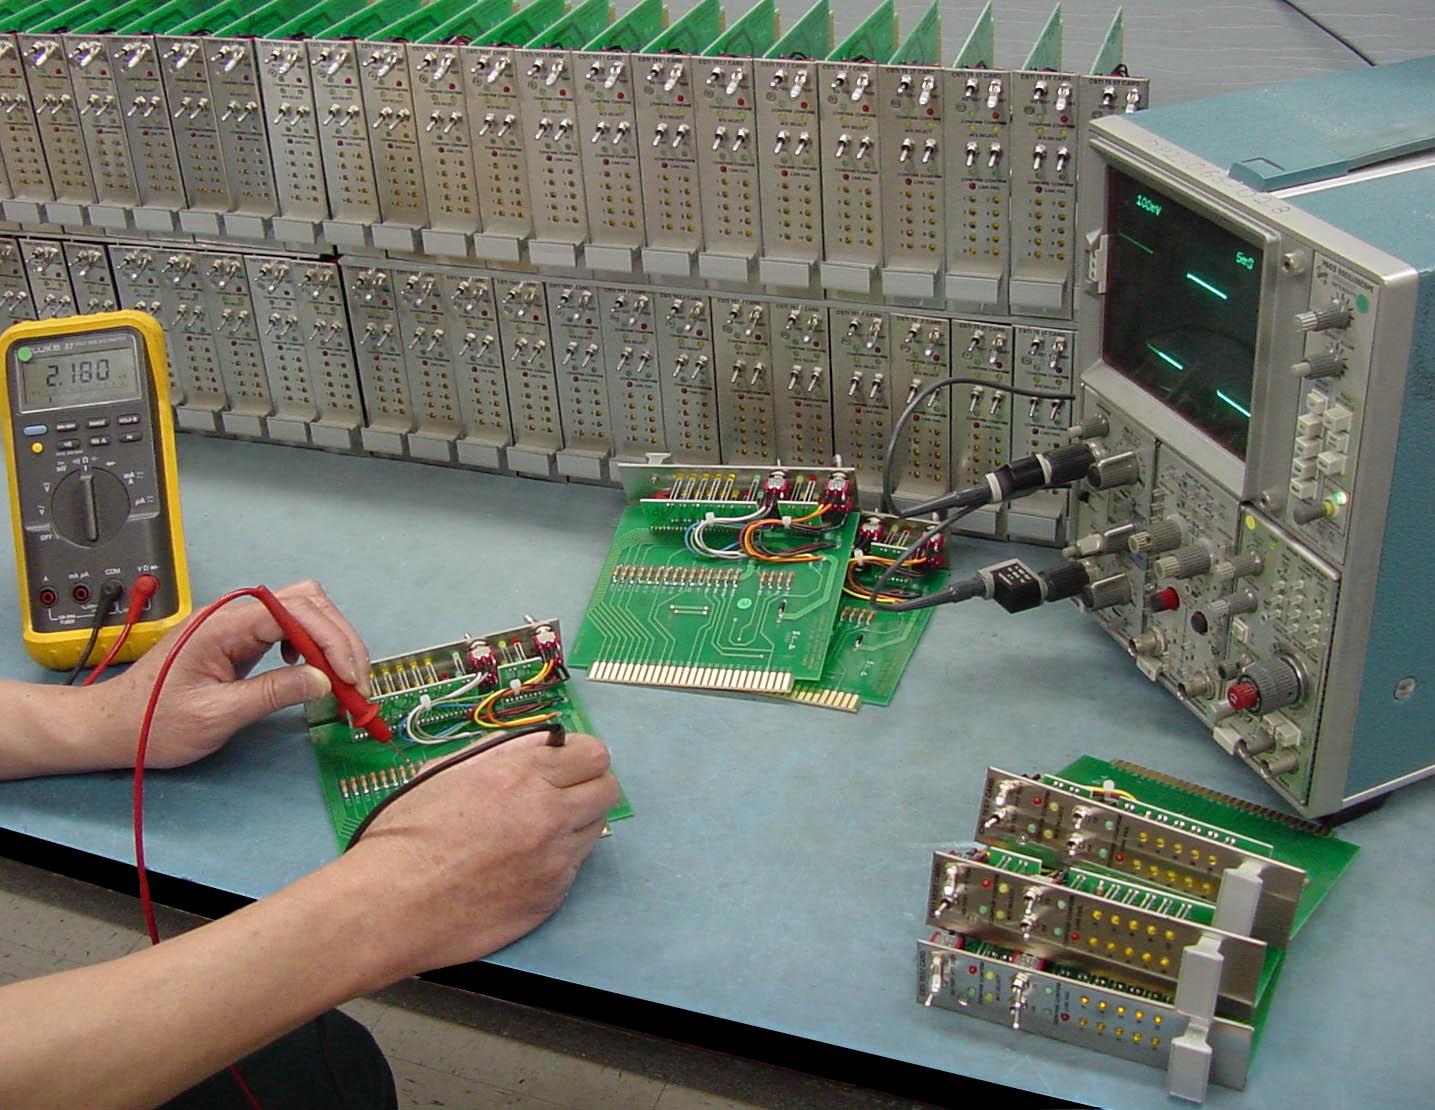 Electronic Circuit Design Home Not Lossing Wiring Diagram Electrical Libguides At Riphah International Rh Edu Pk Guide